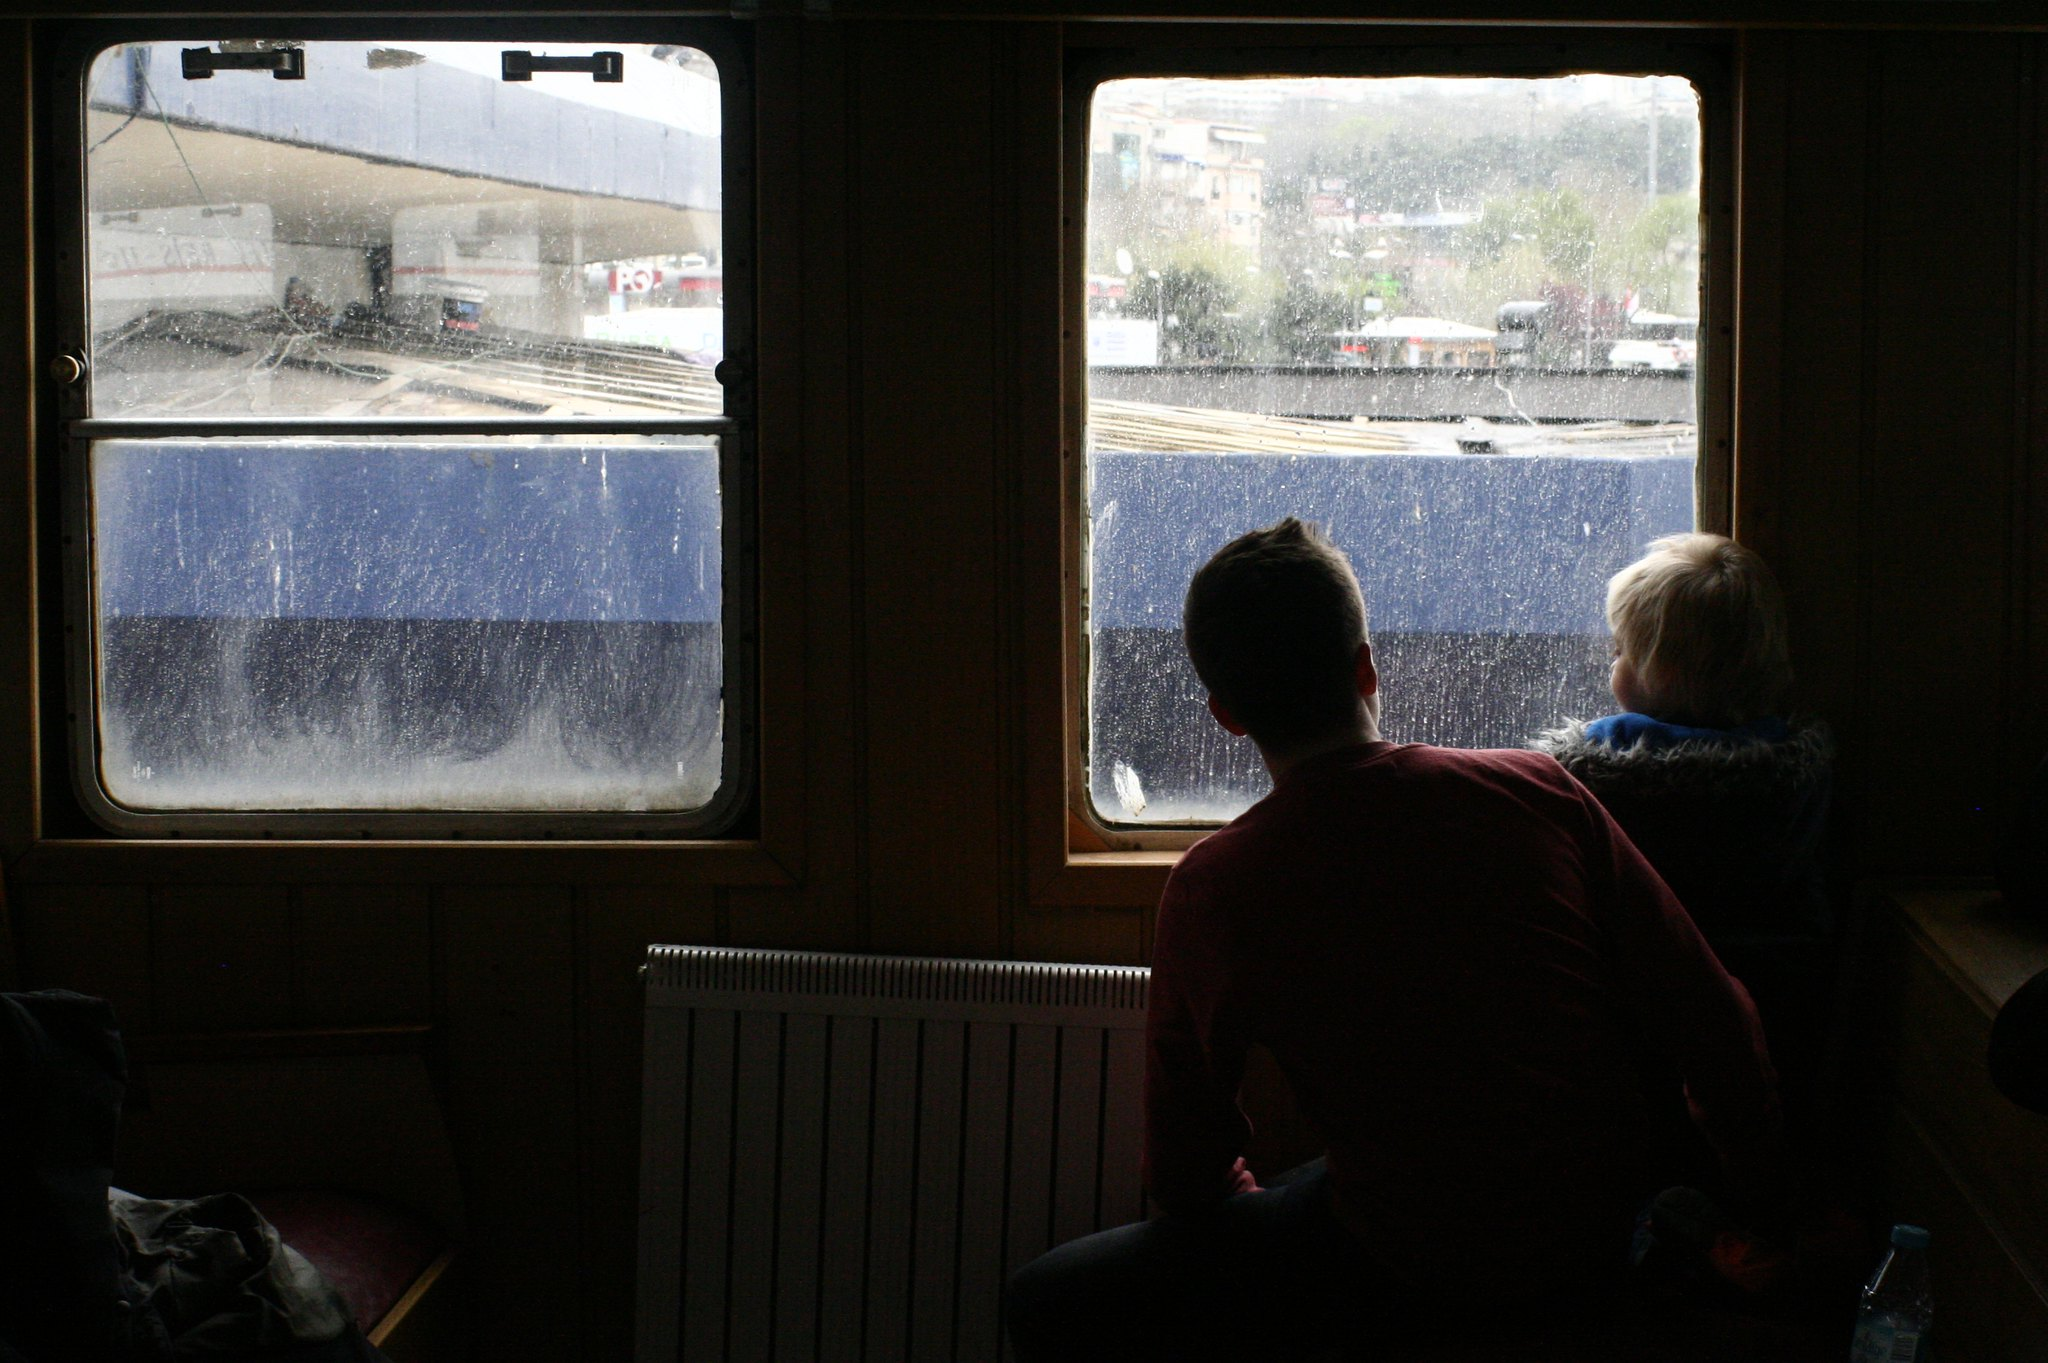 Waiting for departure at Kabataş